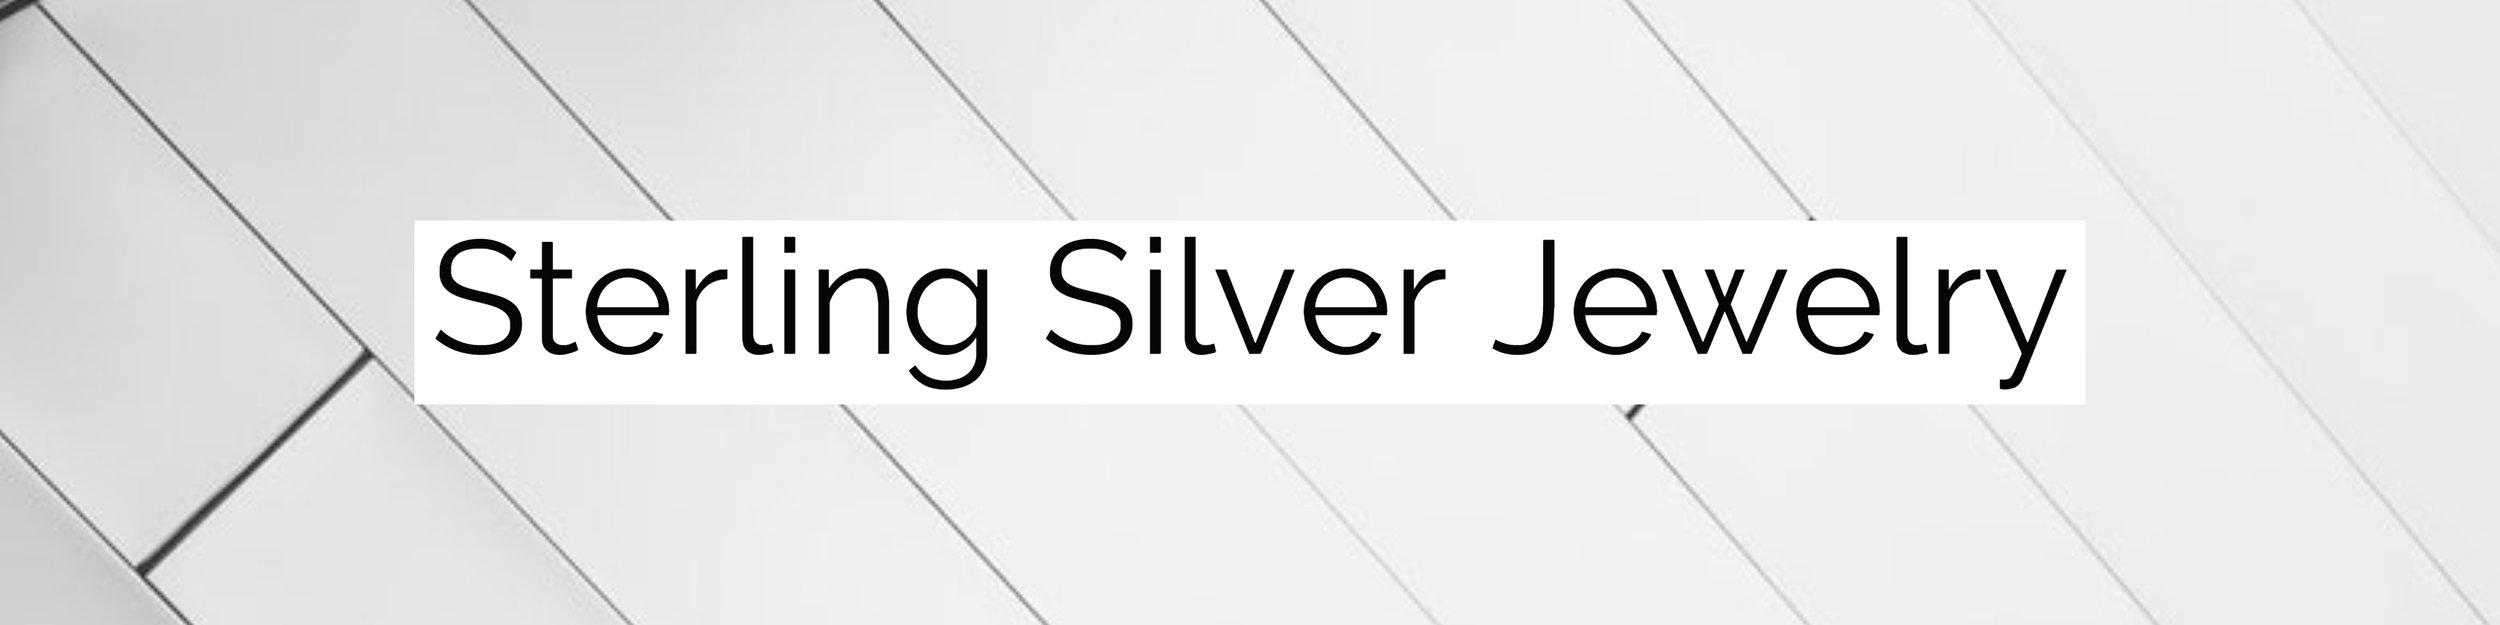 Sterling silver banner.jpg